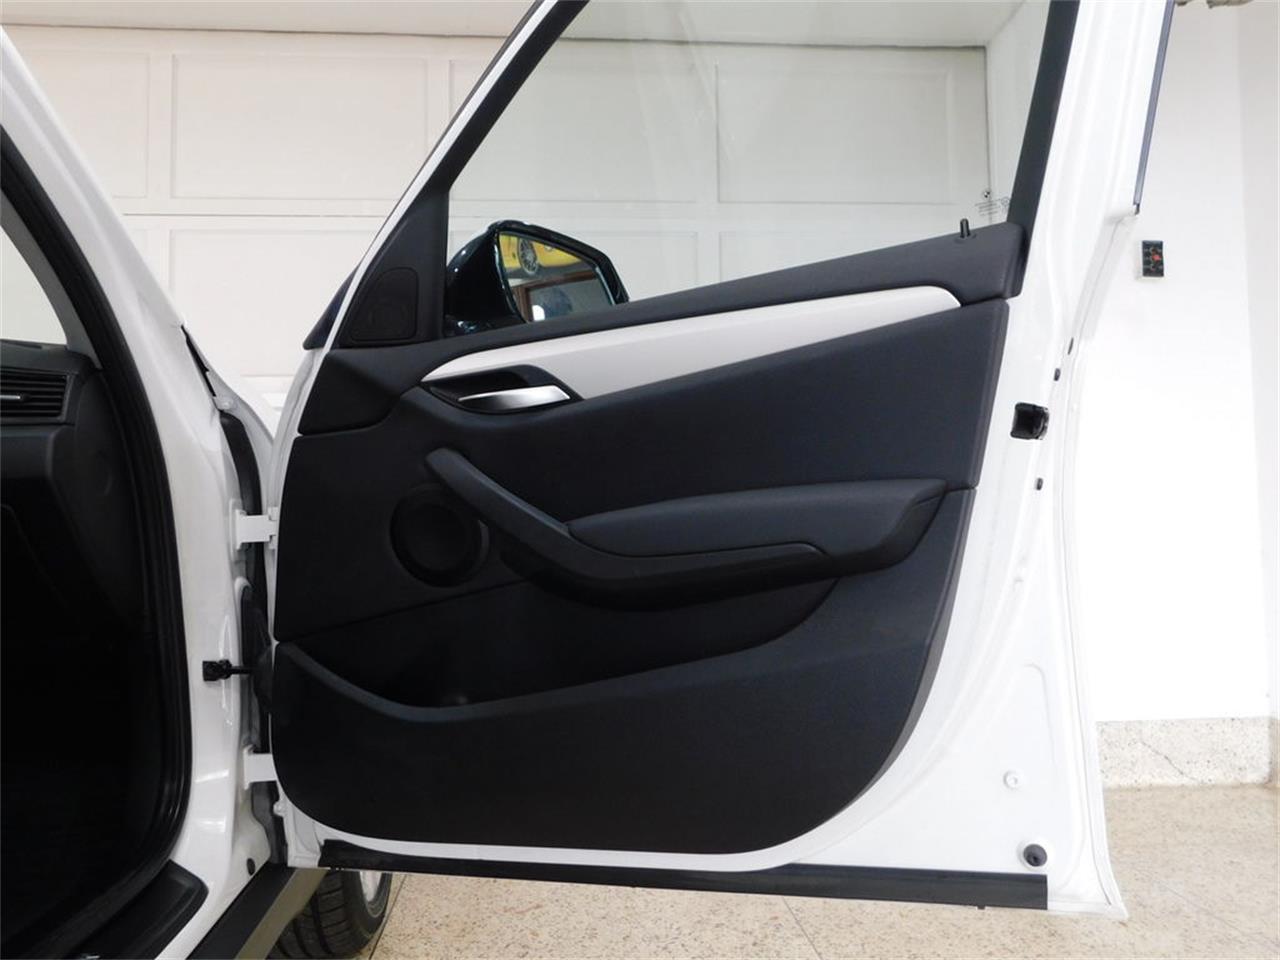 2013 BMW X1 (CC-1419293) for sale in Hamburg, New York